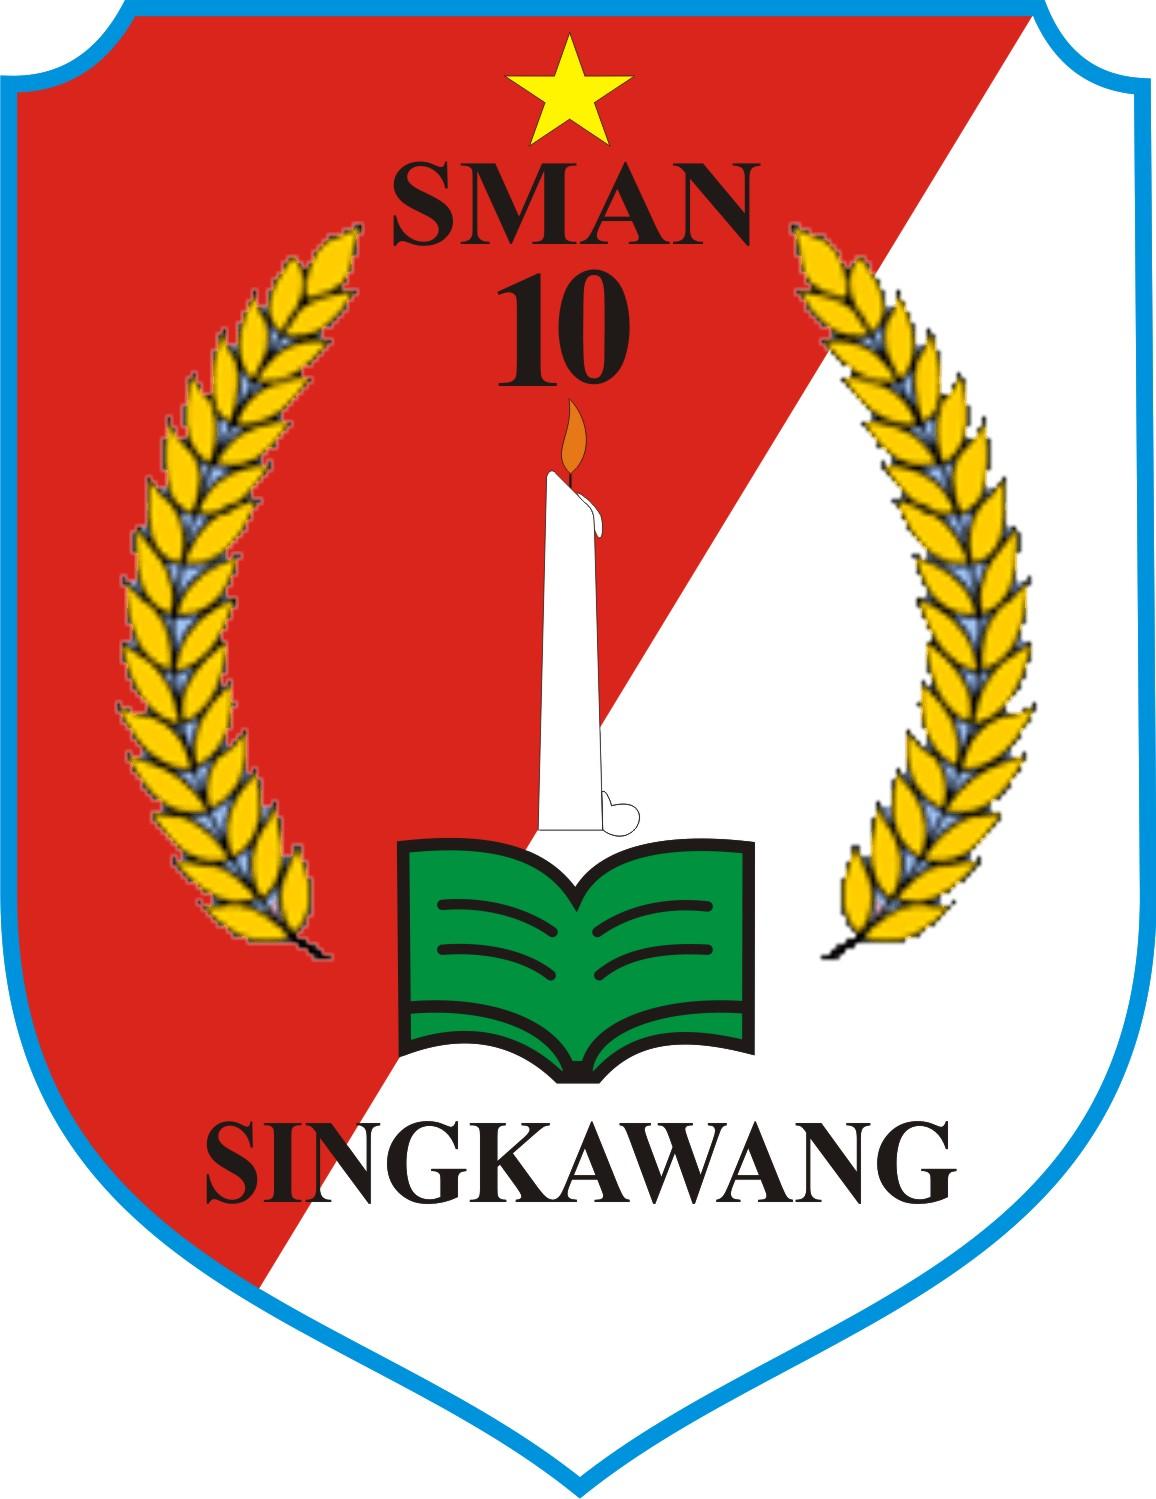 SMAN 10 Singkawang